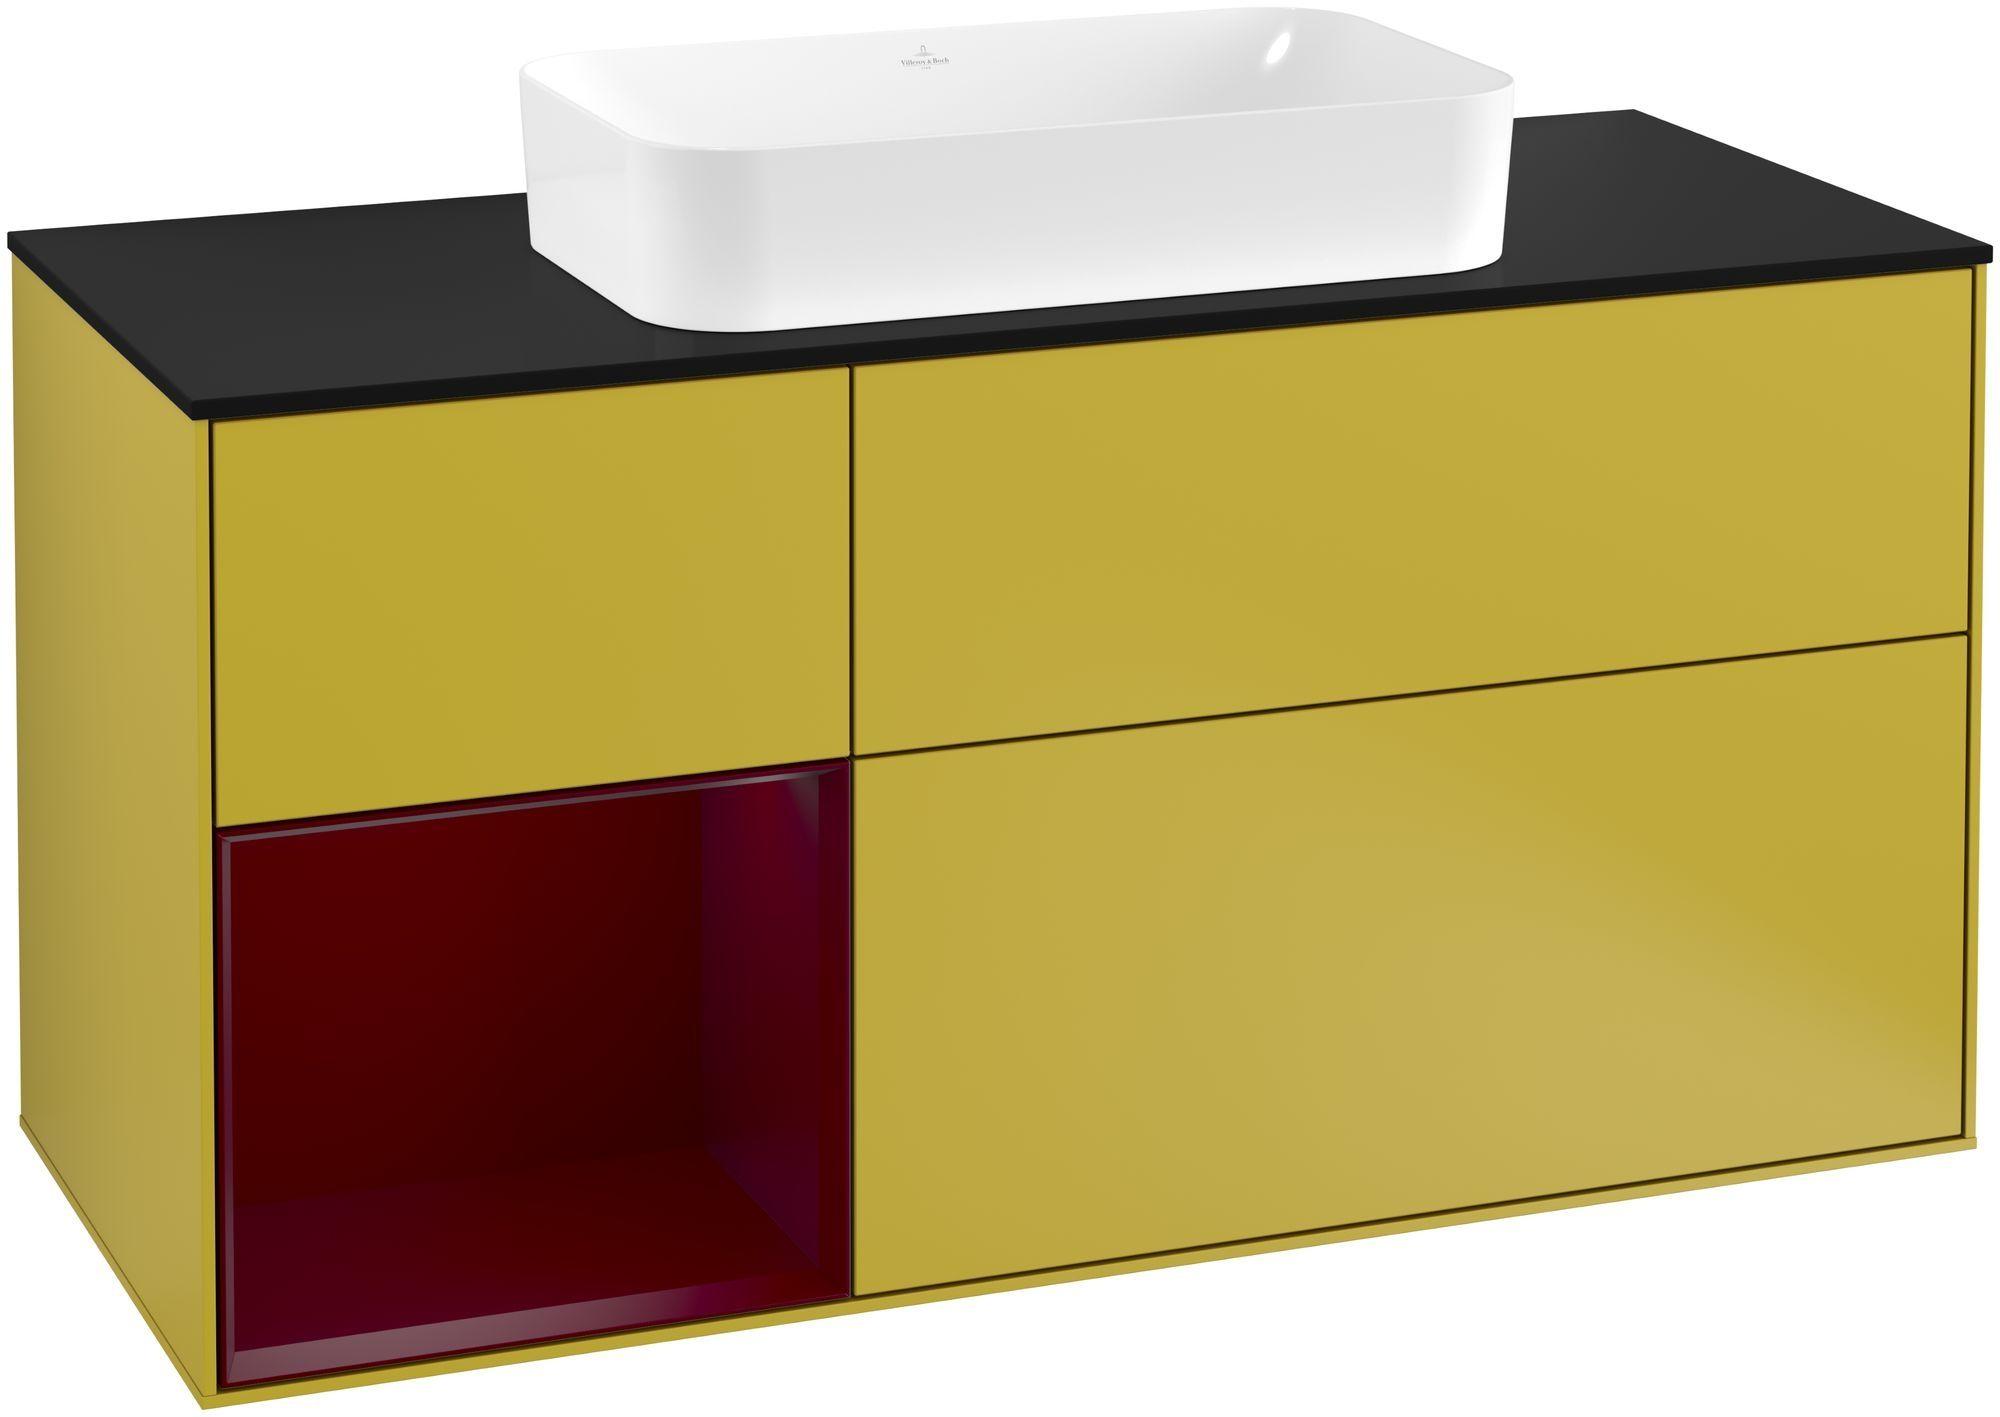 Villeroy & Boch Finion G29 Waschtischunterschrank mit Regalelement 3 Auszüge Waschtisch mittig LED-Beleuchtung B:120xH:60,3xT:50,1cm Front, Korpus: Sun, Regal: Peony, Glasplatte: Black Matt G292HBHE